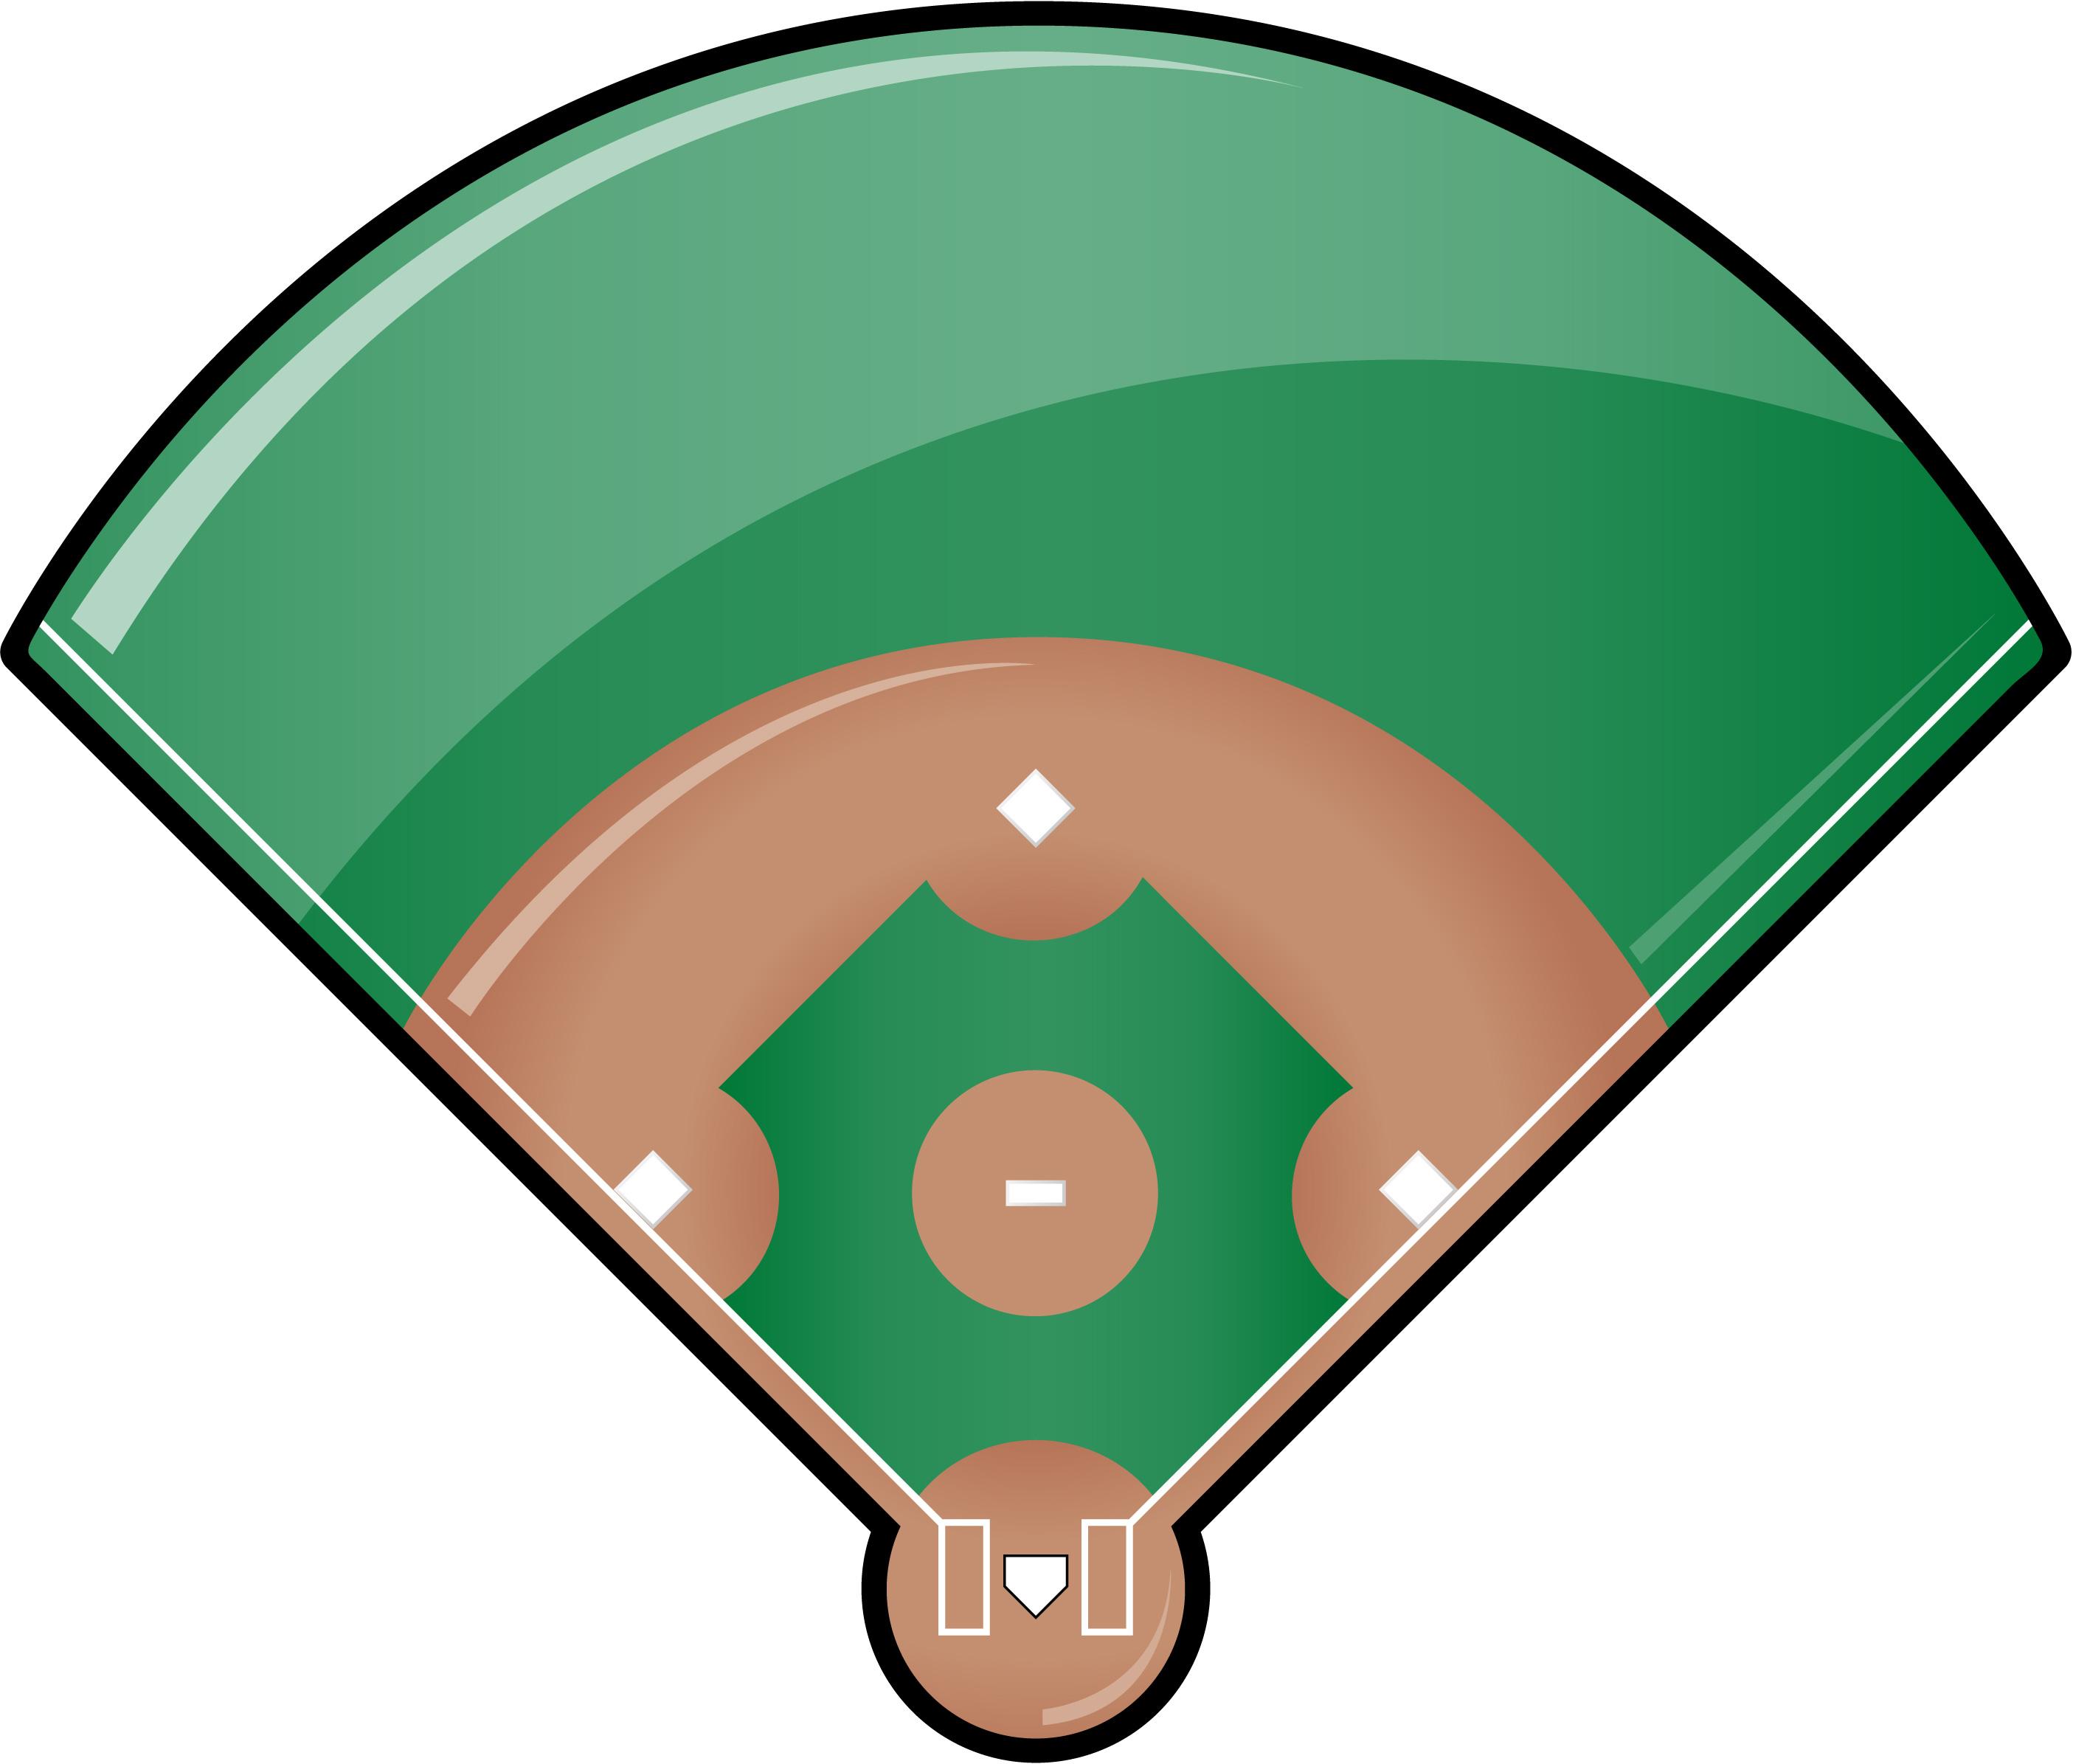 football stadium clipart at getdrawings com free for personal use rh getdrawings com baseball stadium clipart free